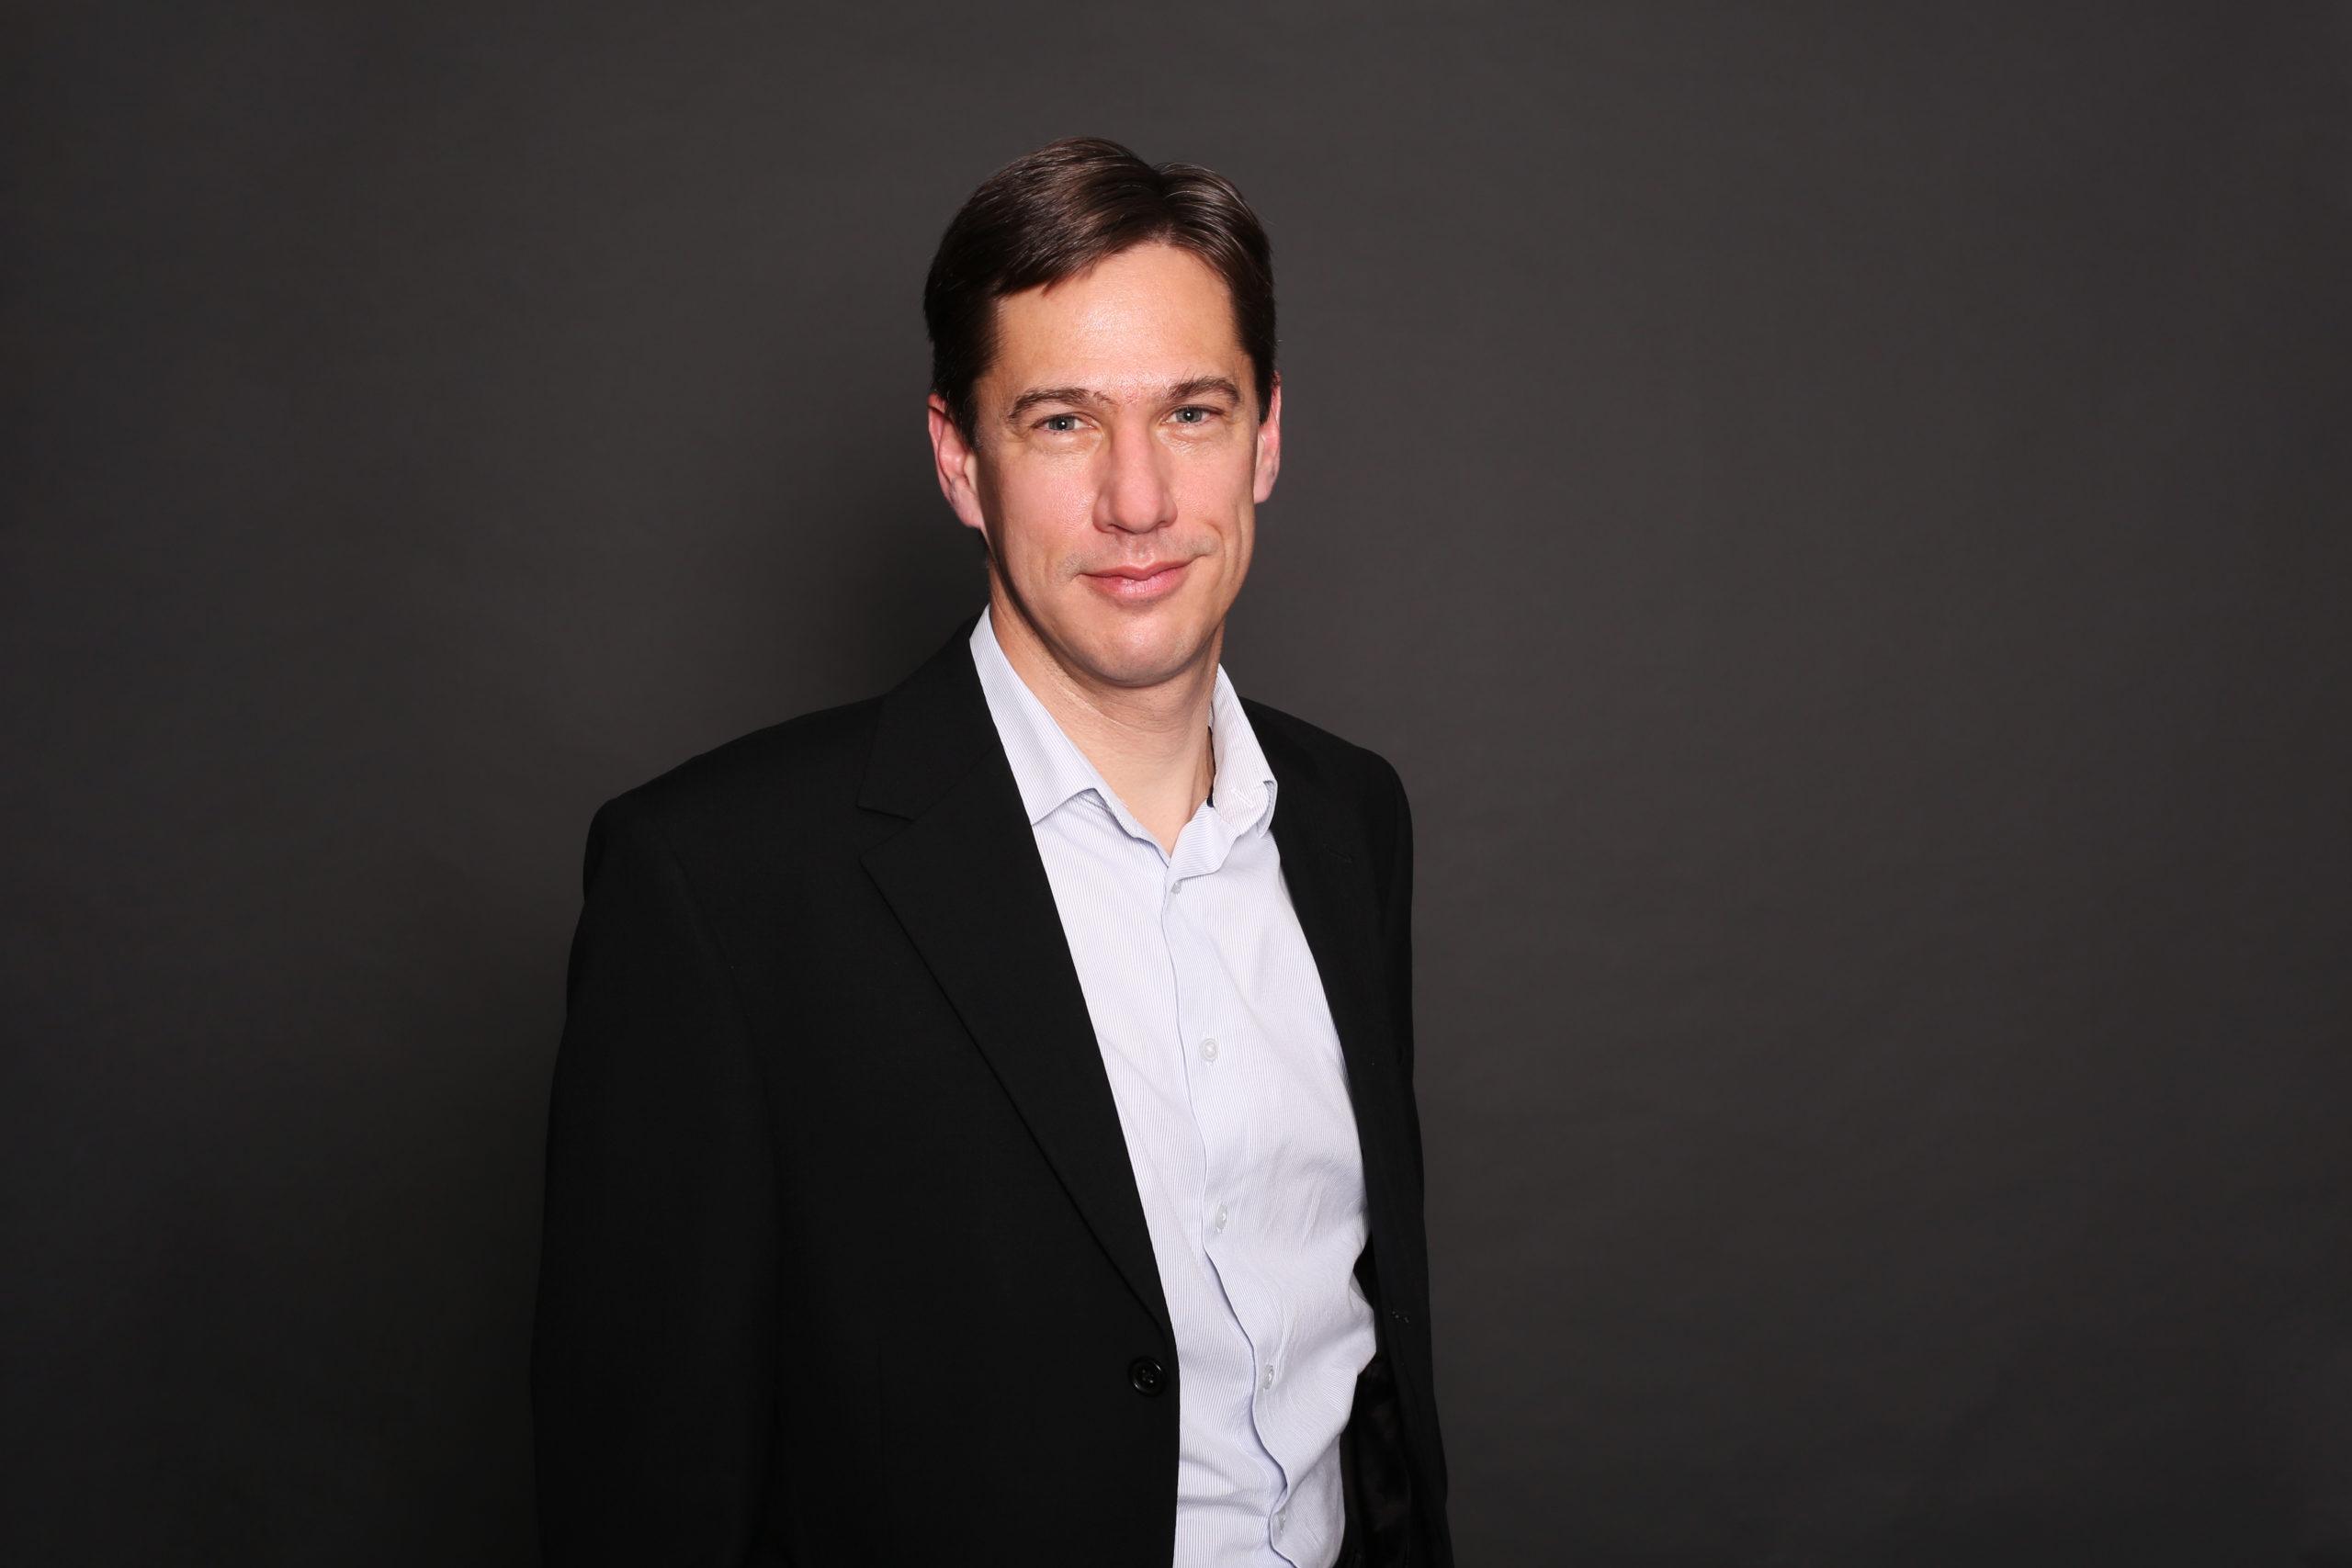 "<a target = ""_blank"" href = ""https://fairtree.com/the-team/operations-team-personal-investor-sa/#heinrich"">Heinrich Jansen van Rensburg</a>"